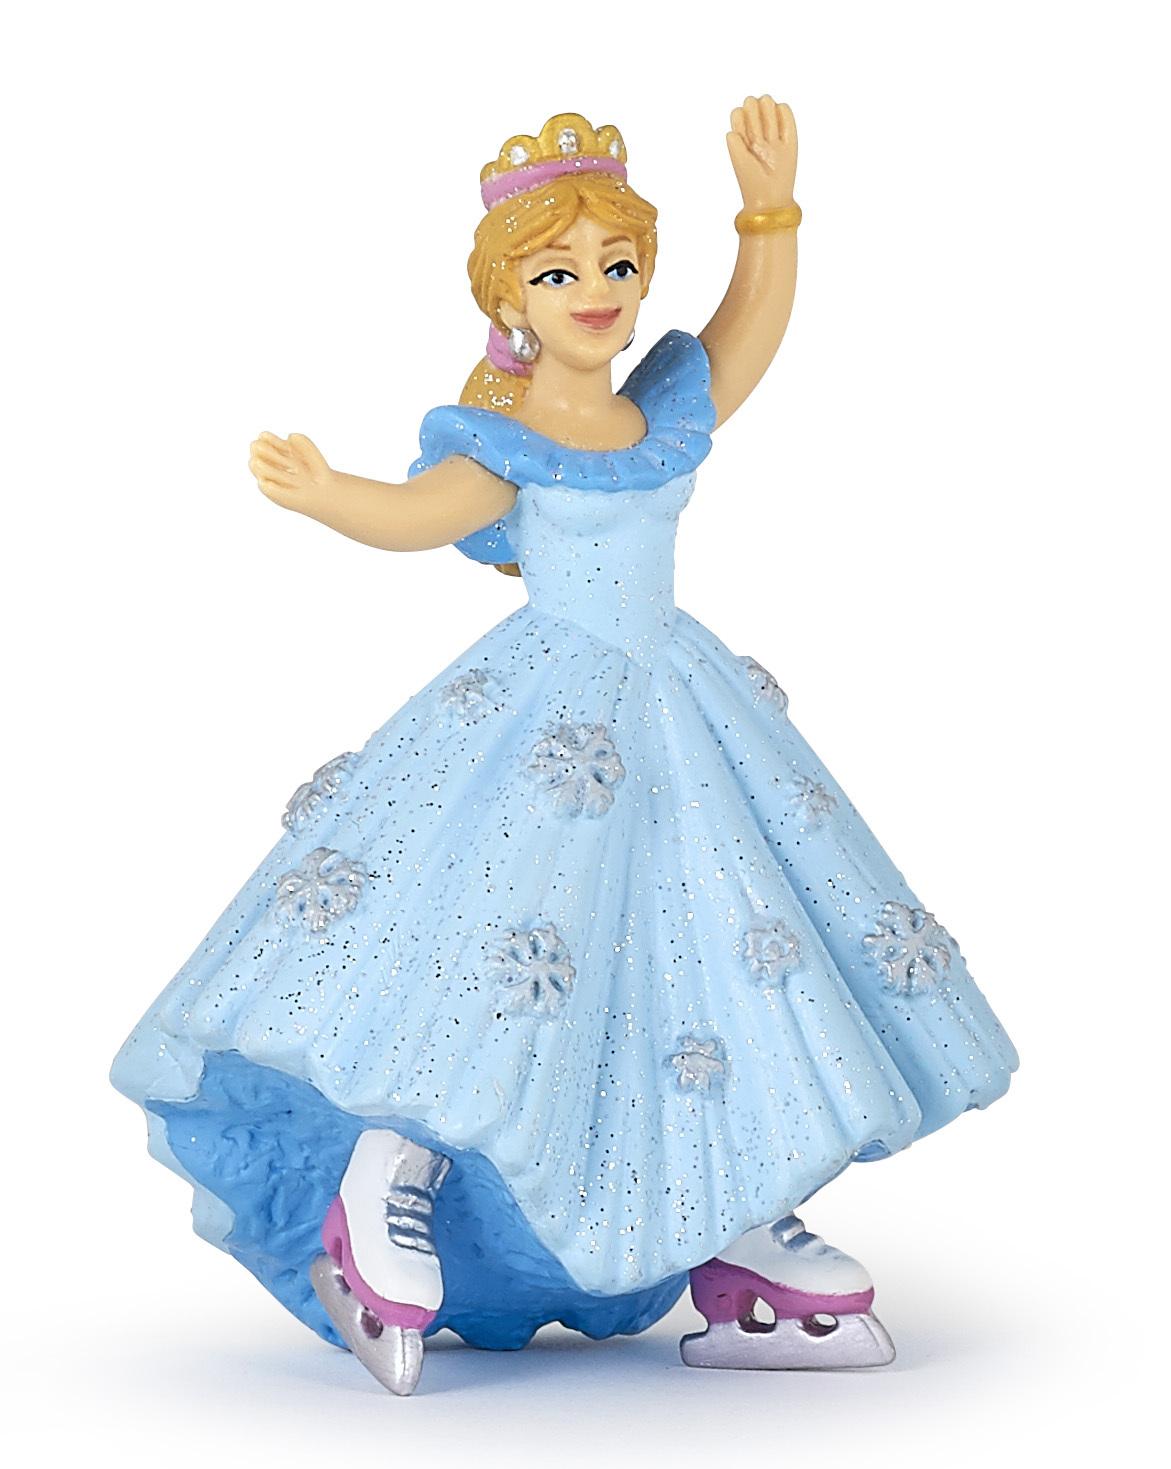 Figurine princesse patins à glace